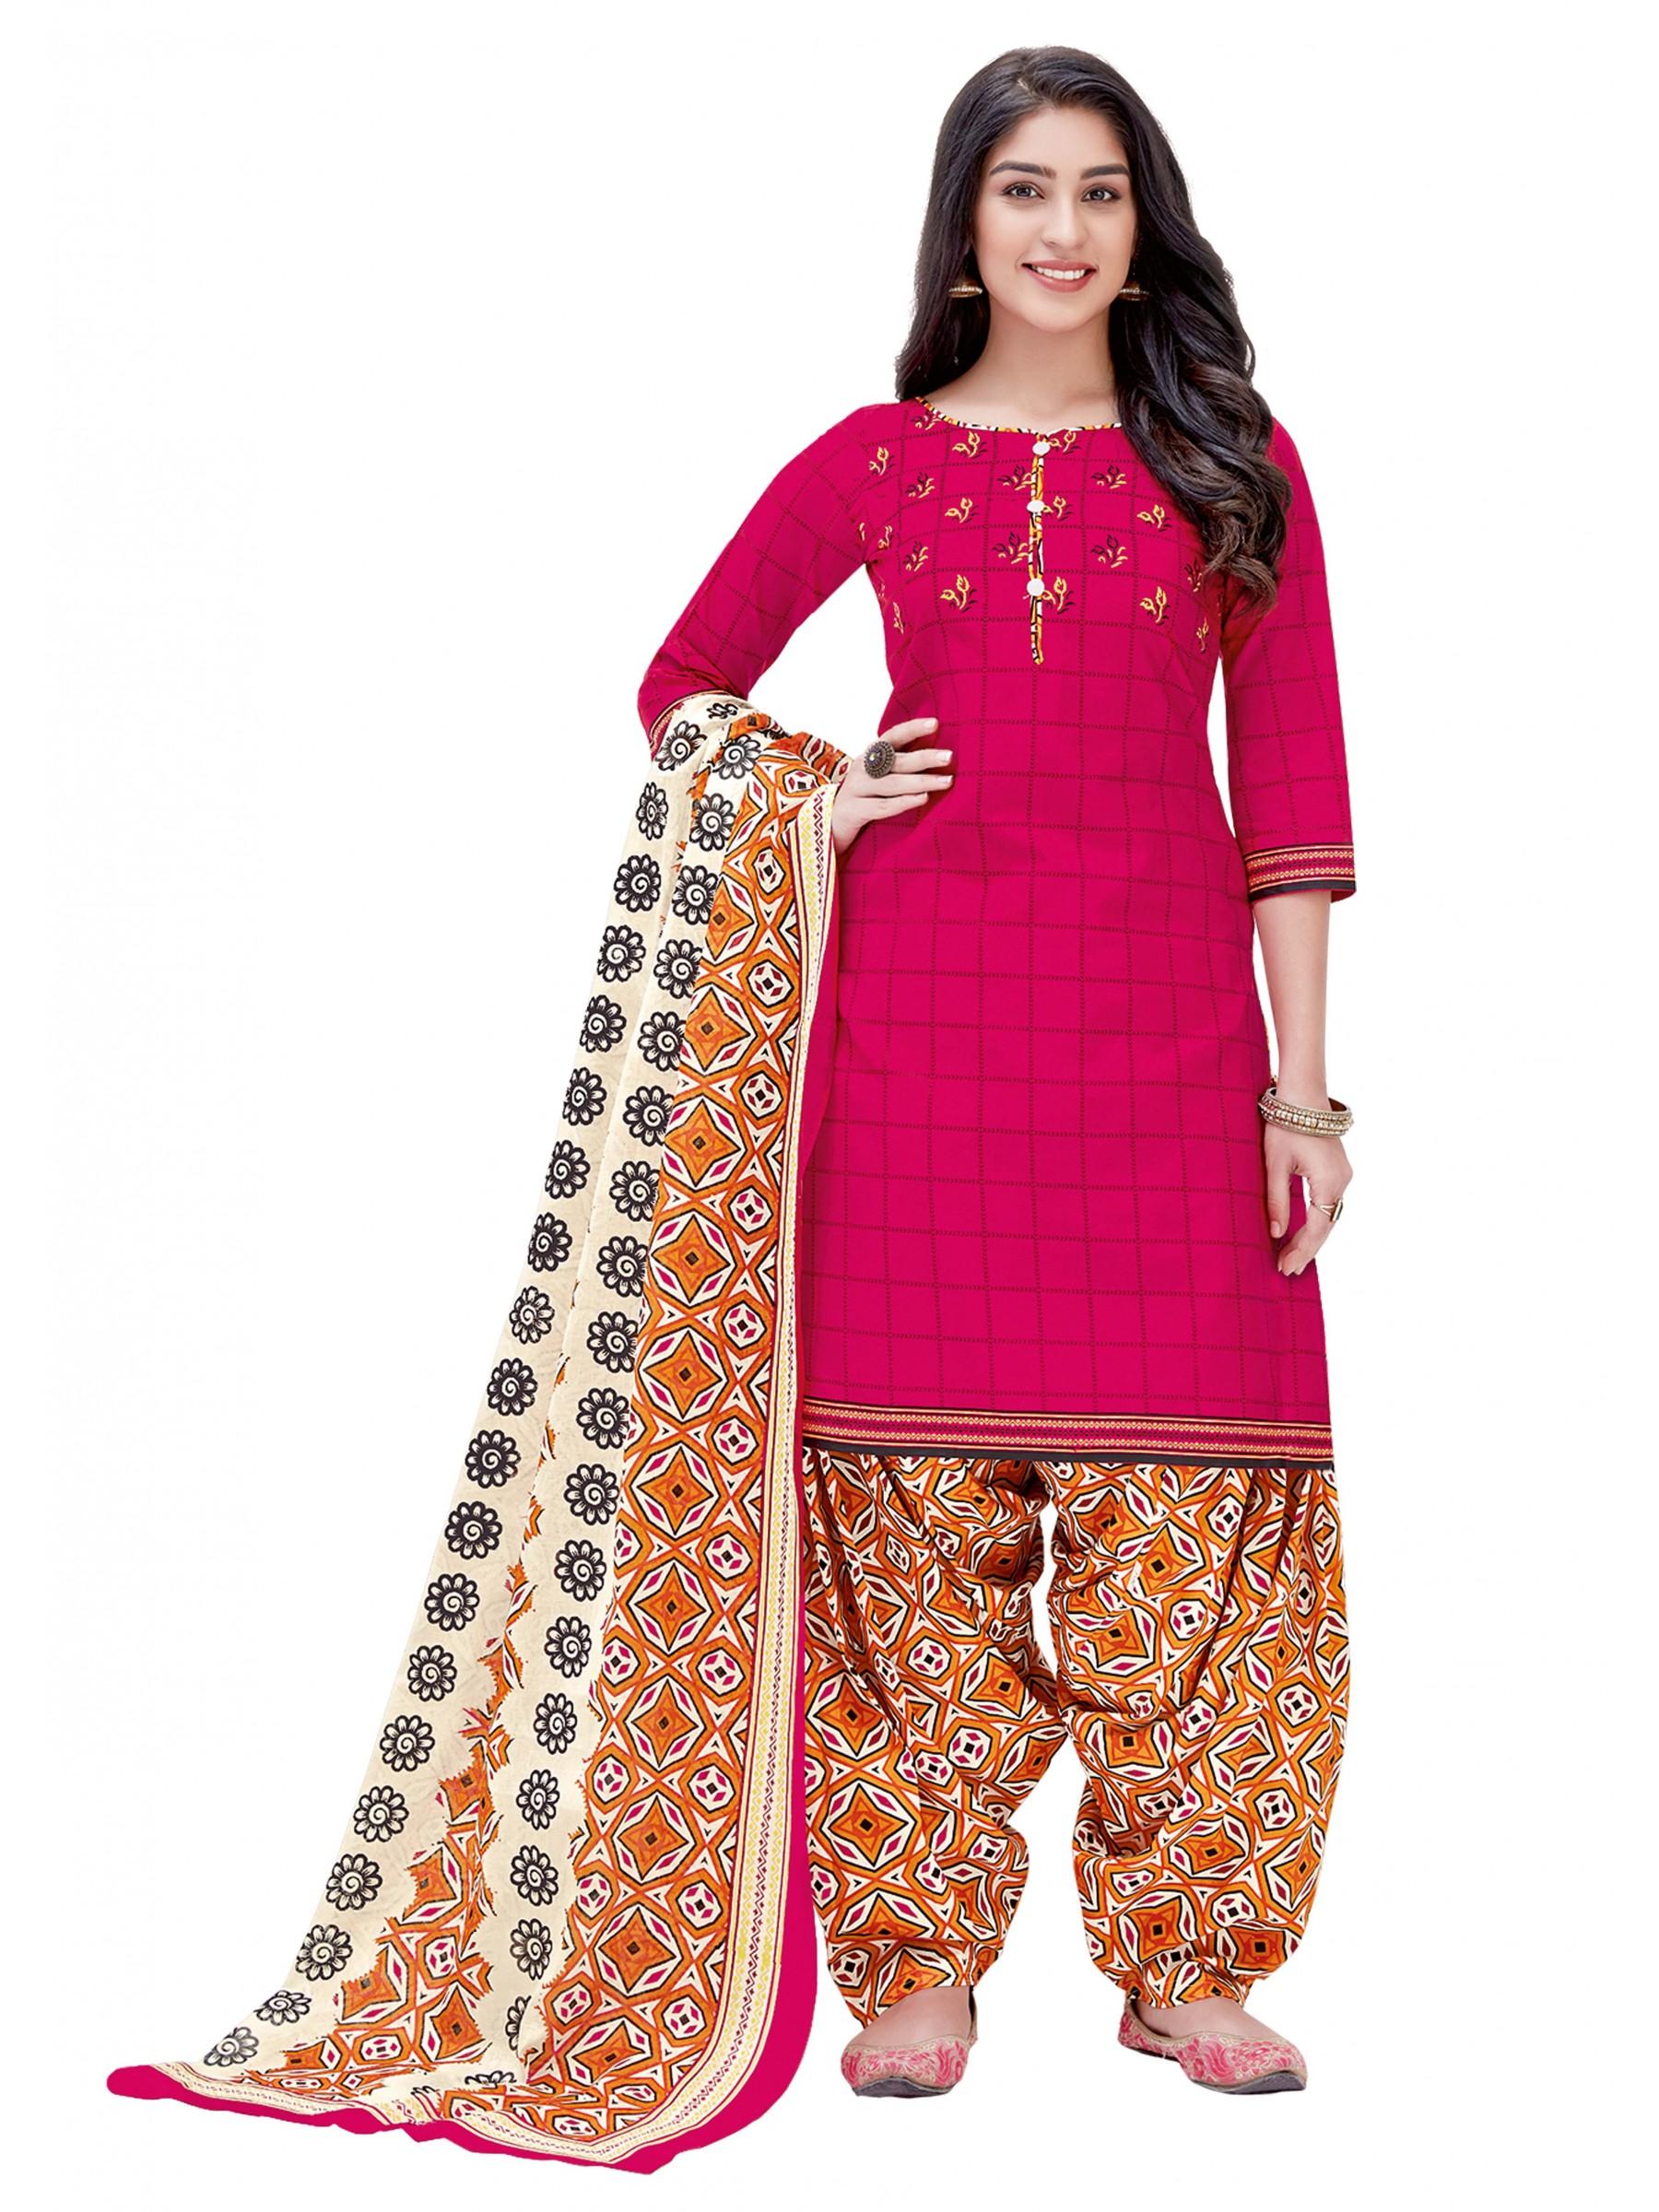 Shree Ganesh Women Cotton Un-stitched Dress Material